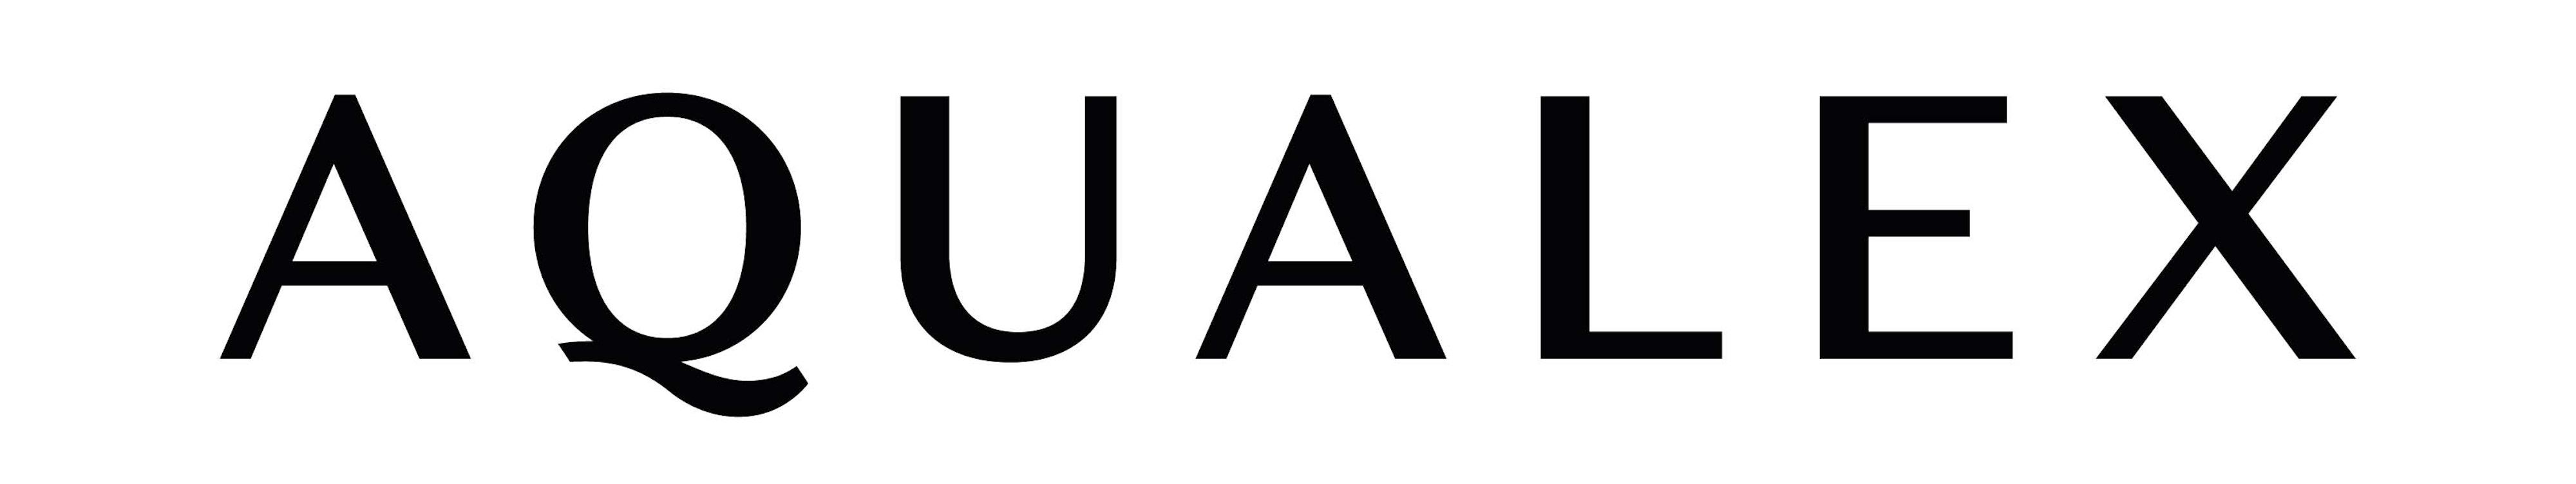 AQUALEX logo